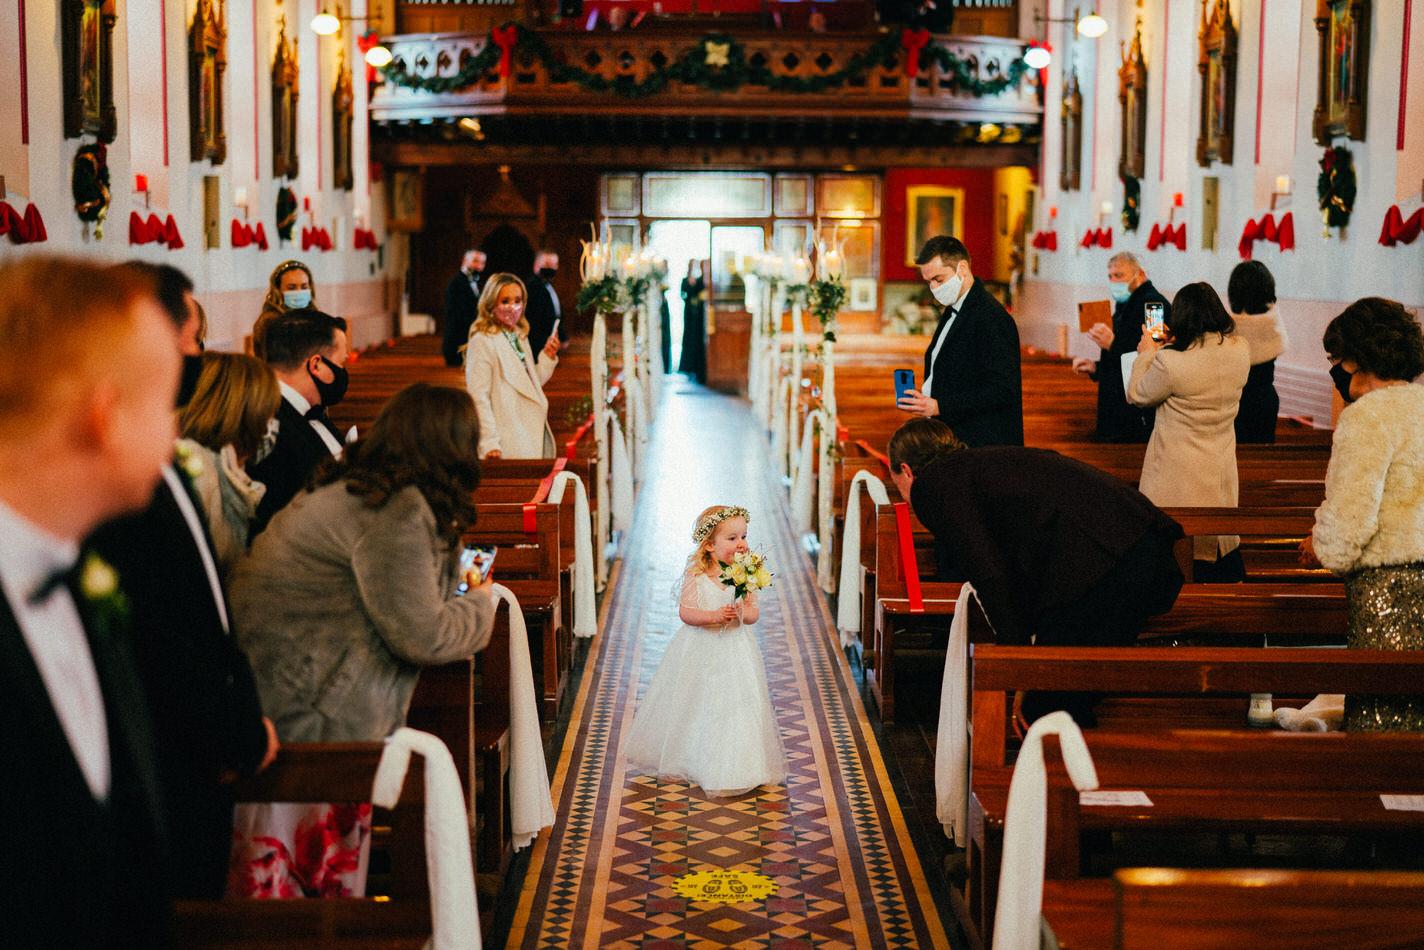 Castle-wedding-ireland-photos- 0109 74